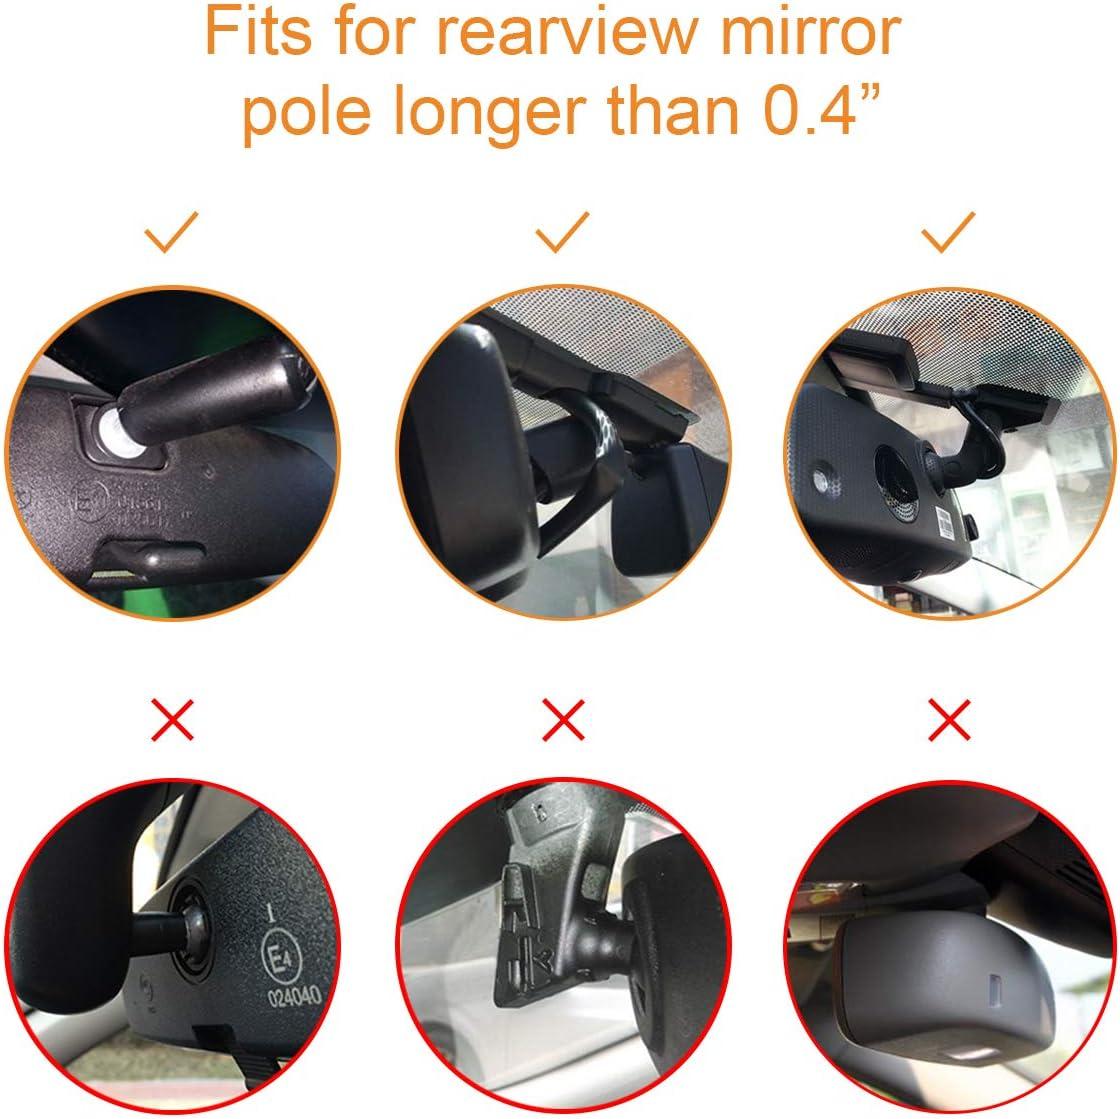 X3 X1 Vantrue Dash Cam Rearview Mirror Mount for N2 Pro V1P Dash Cams Rexing V1 Yi 89006 Dash Cam X1 Pro Dash Cams T1 N2 T2